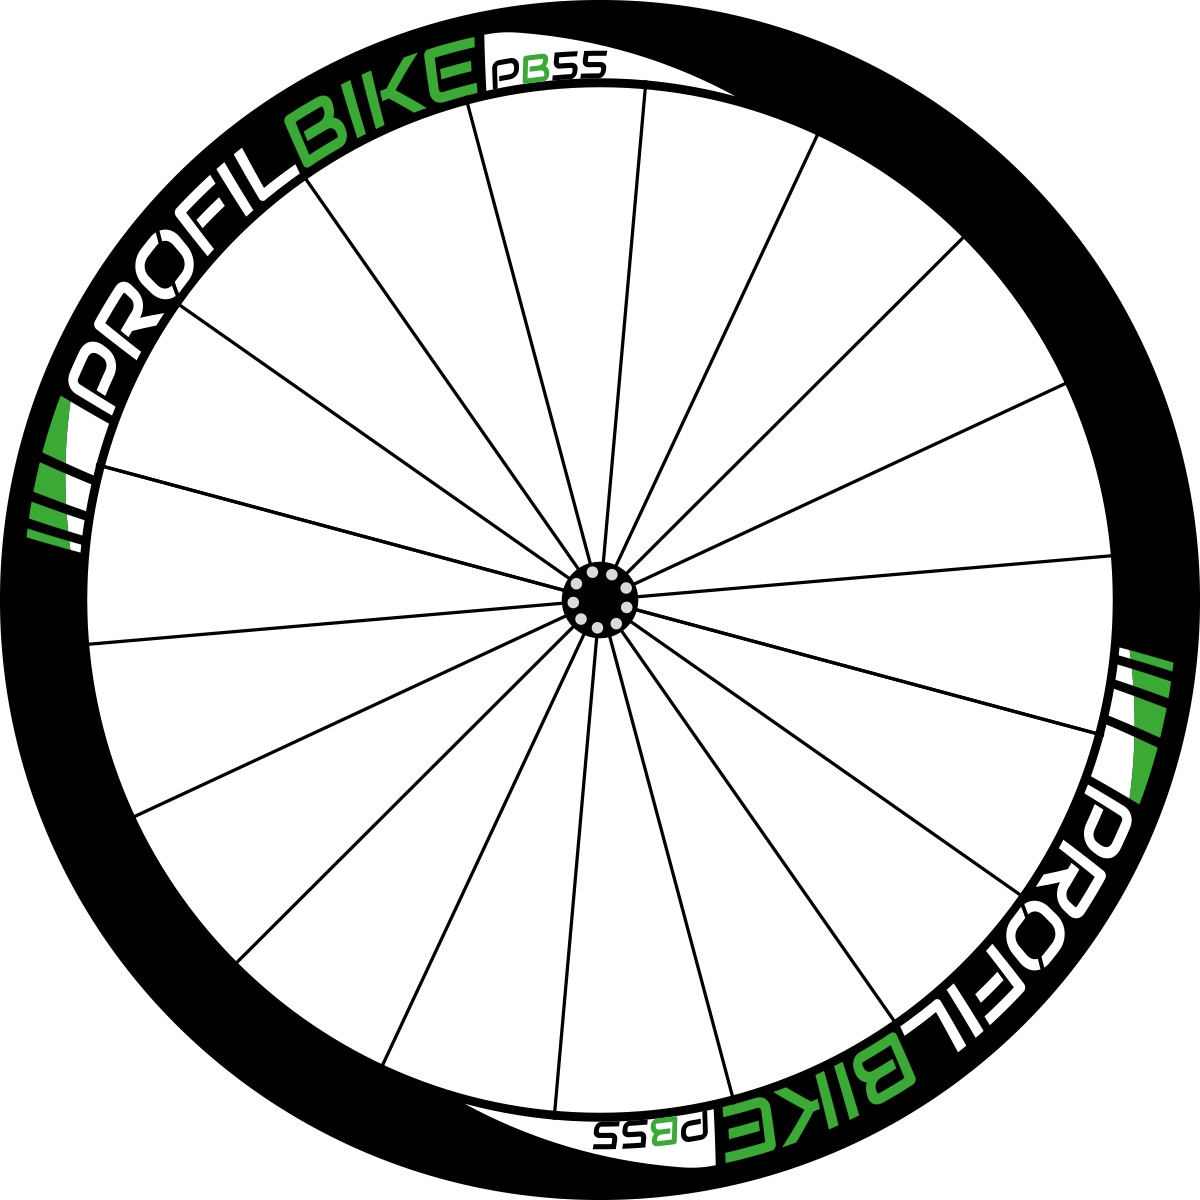 Profilbike PB55 CARBON design vert